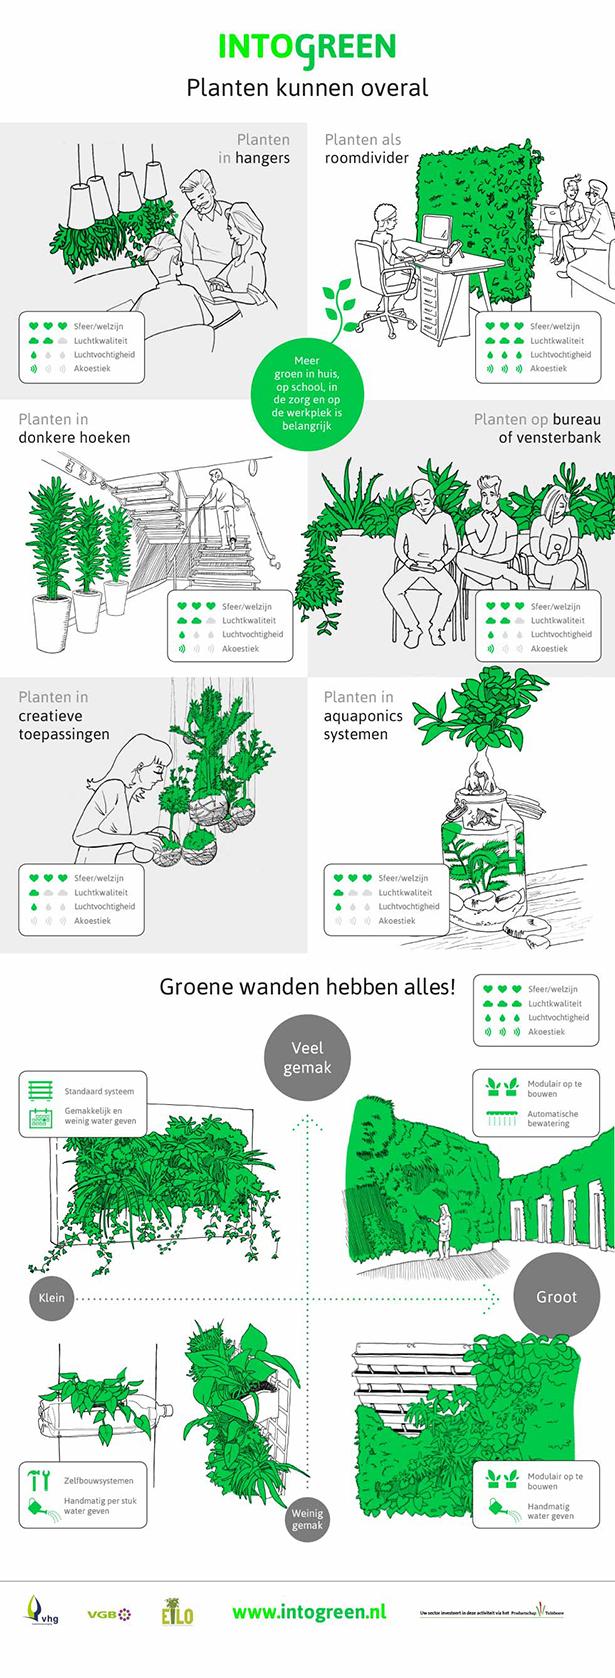 Planten kunnen overal